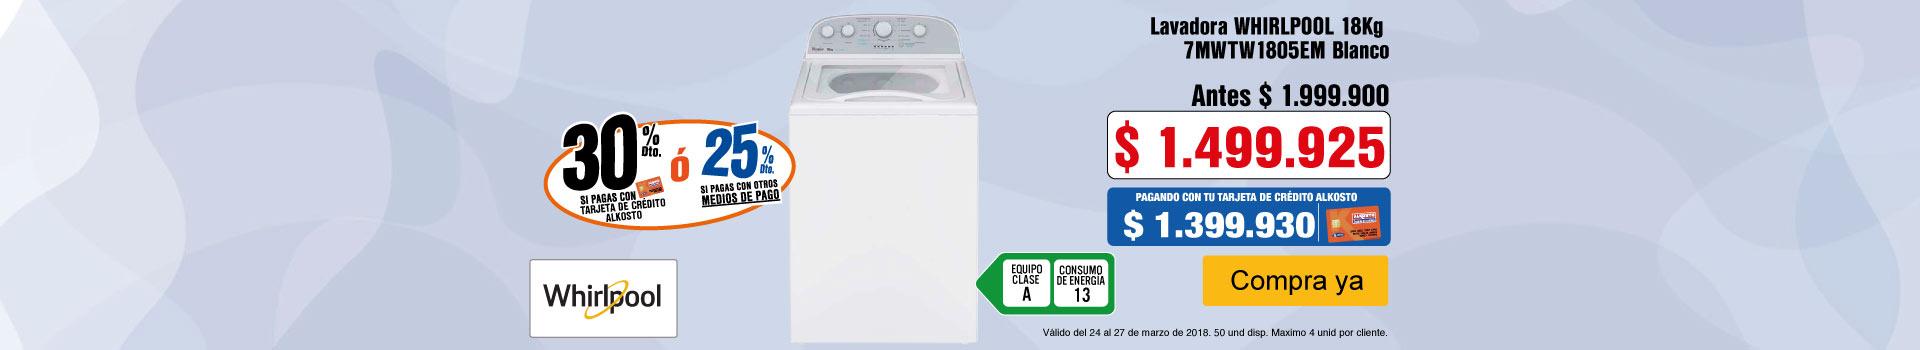 CAT-LAVSEC-AKyKT-3-lb-lavadora-whirlpool-18kg-7mwtw1805em-prod-marzo24-27